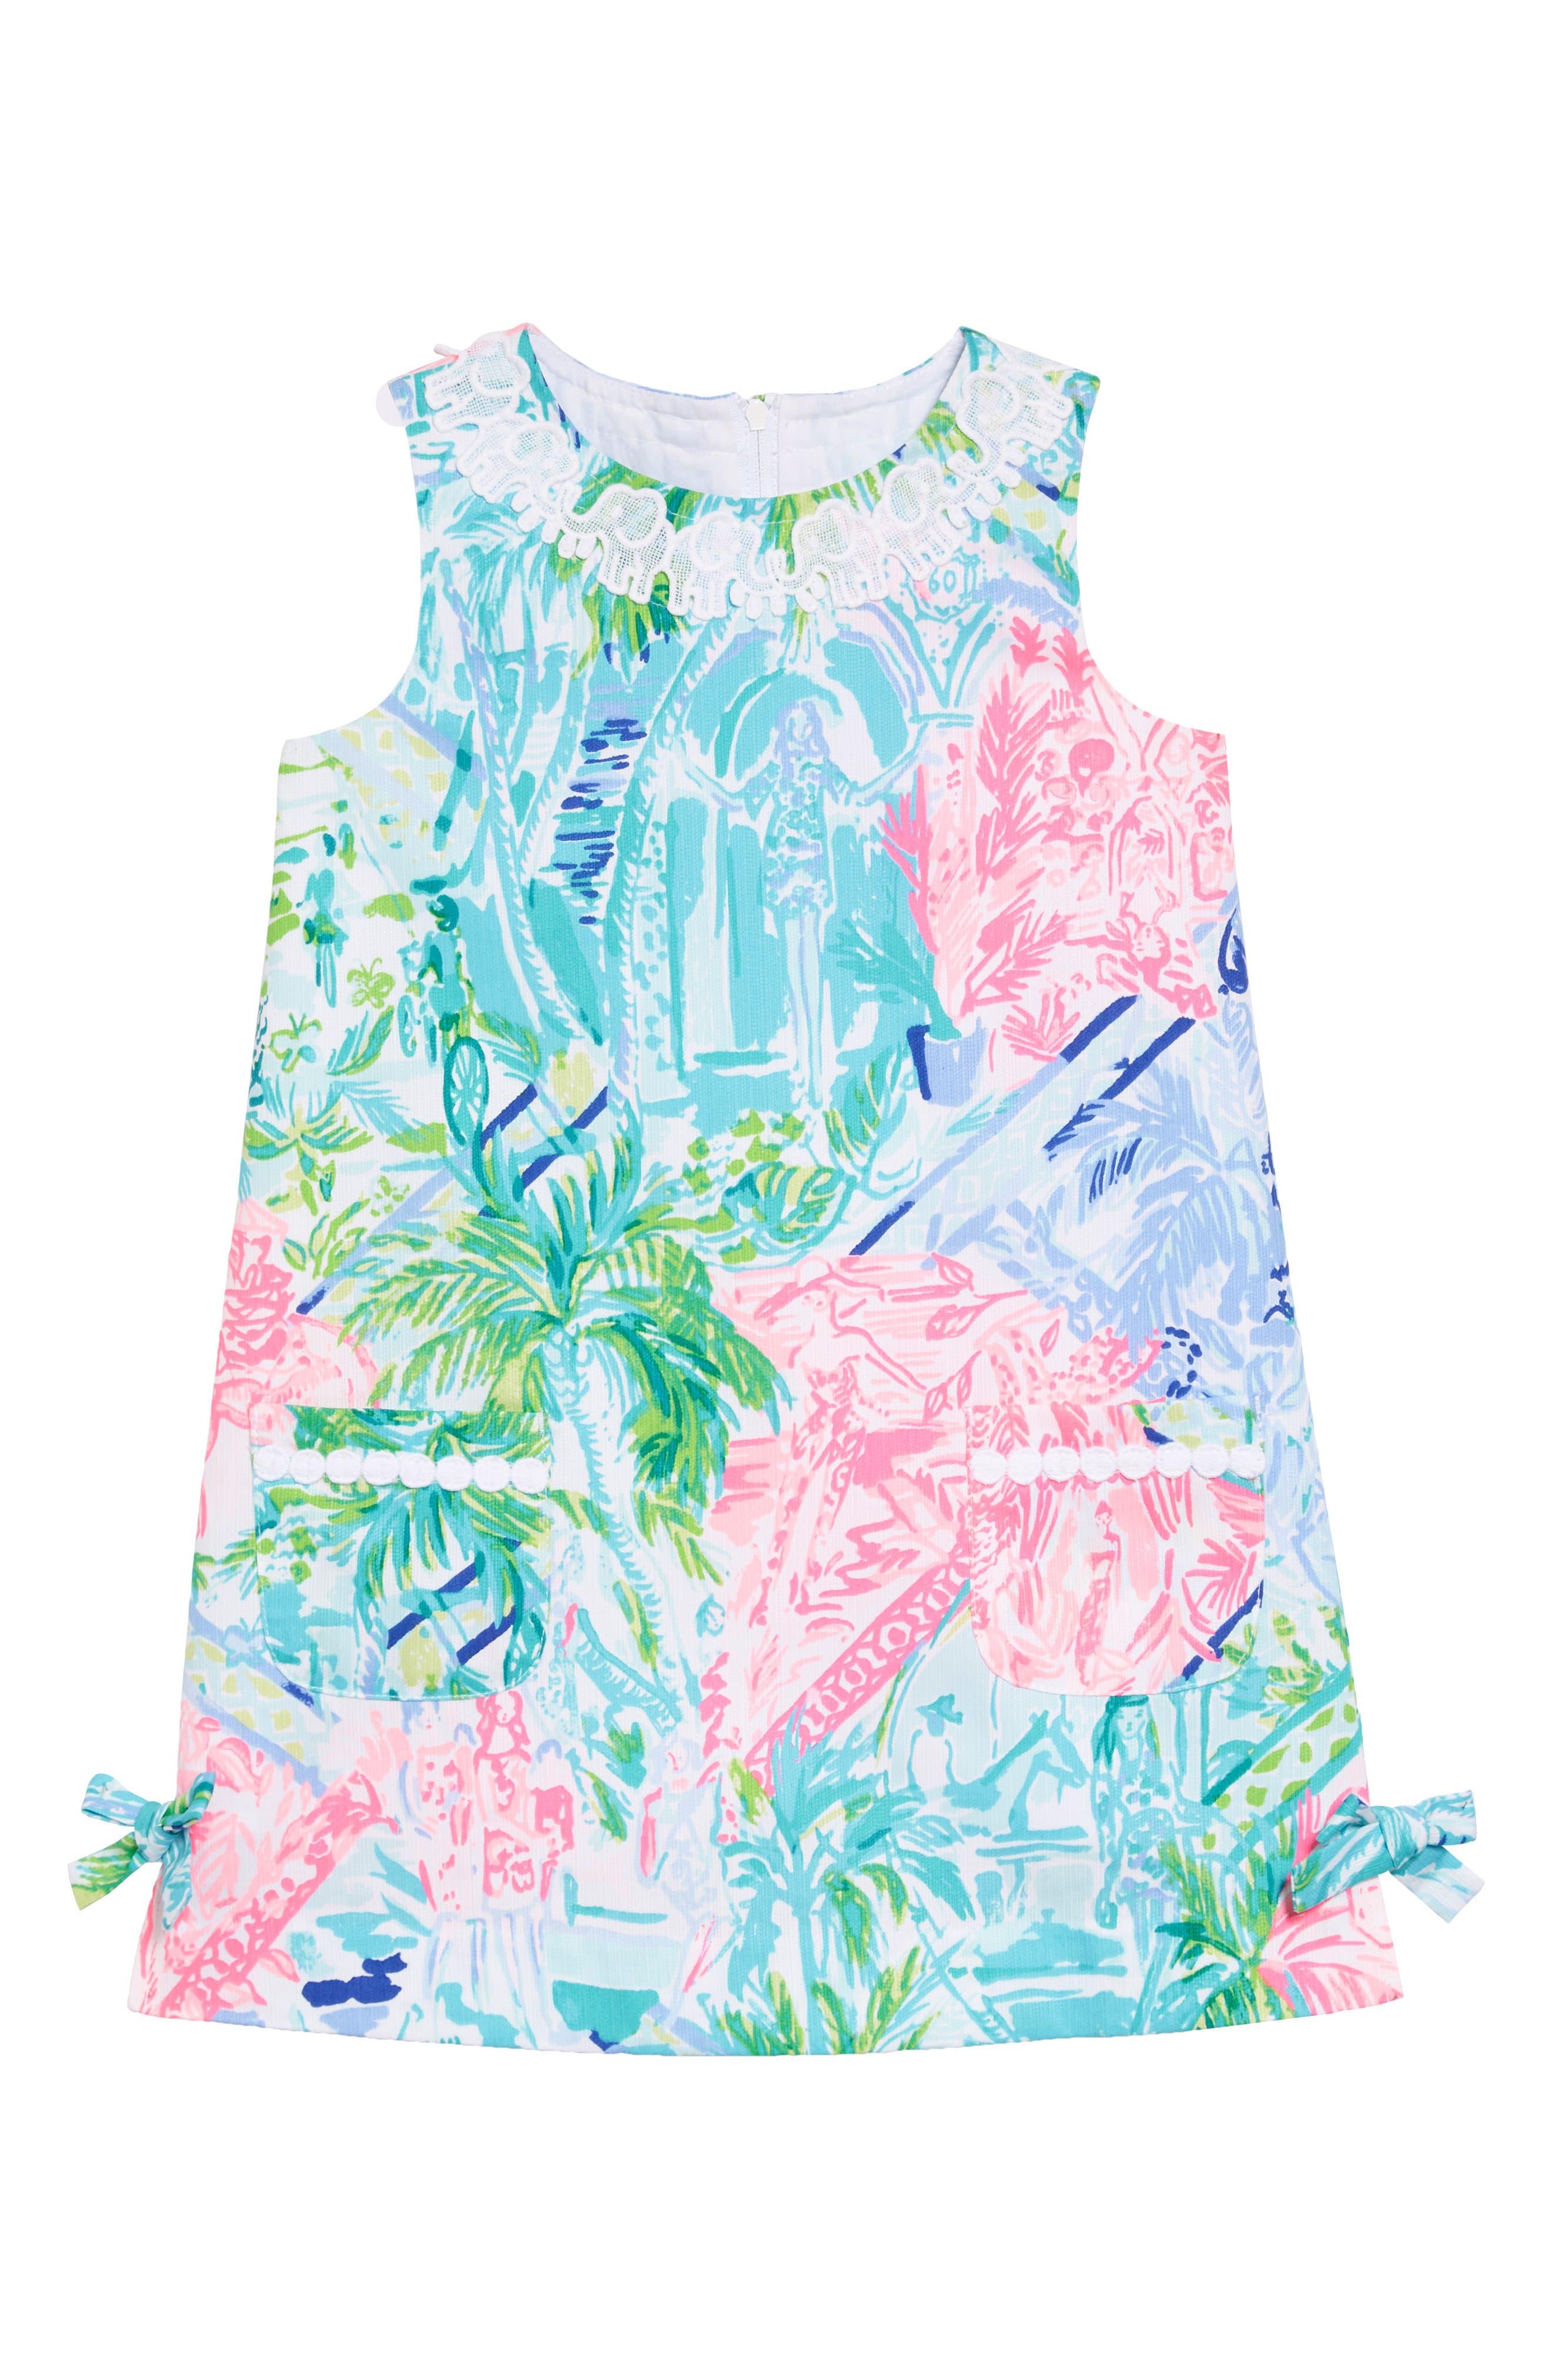 Girls Lilly Pulitzer Little Lily Shift Dress